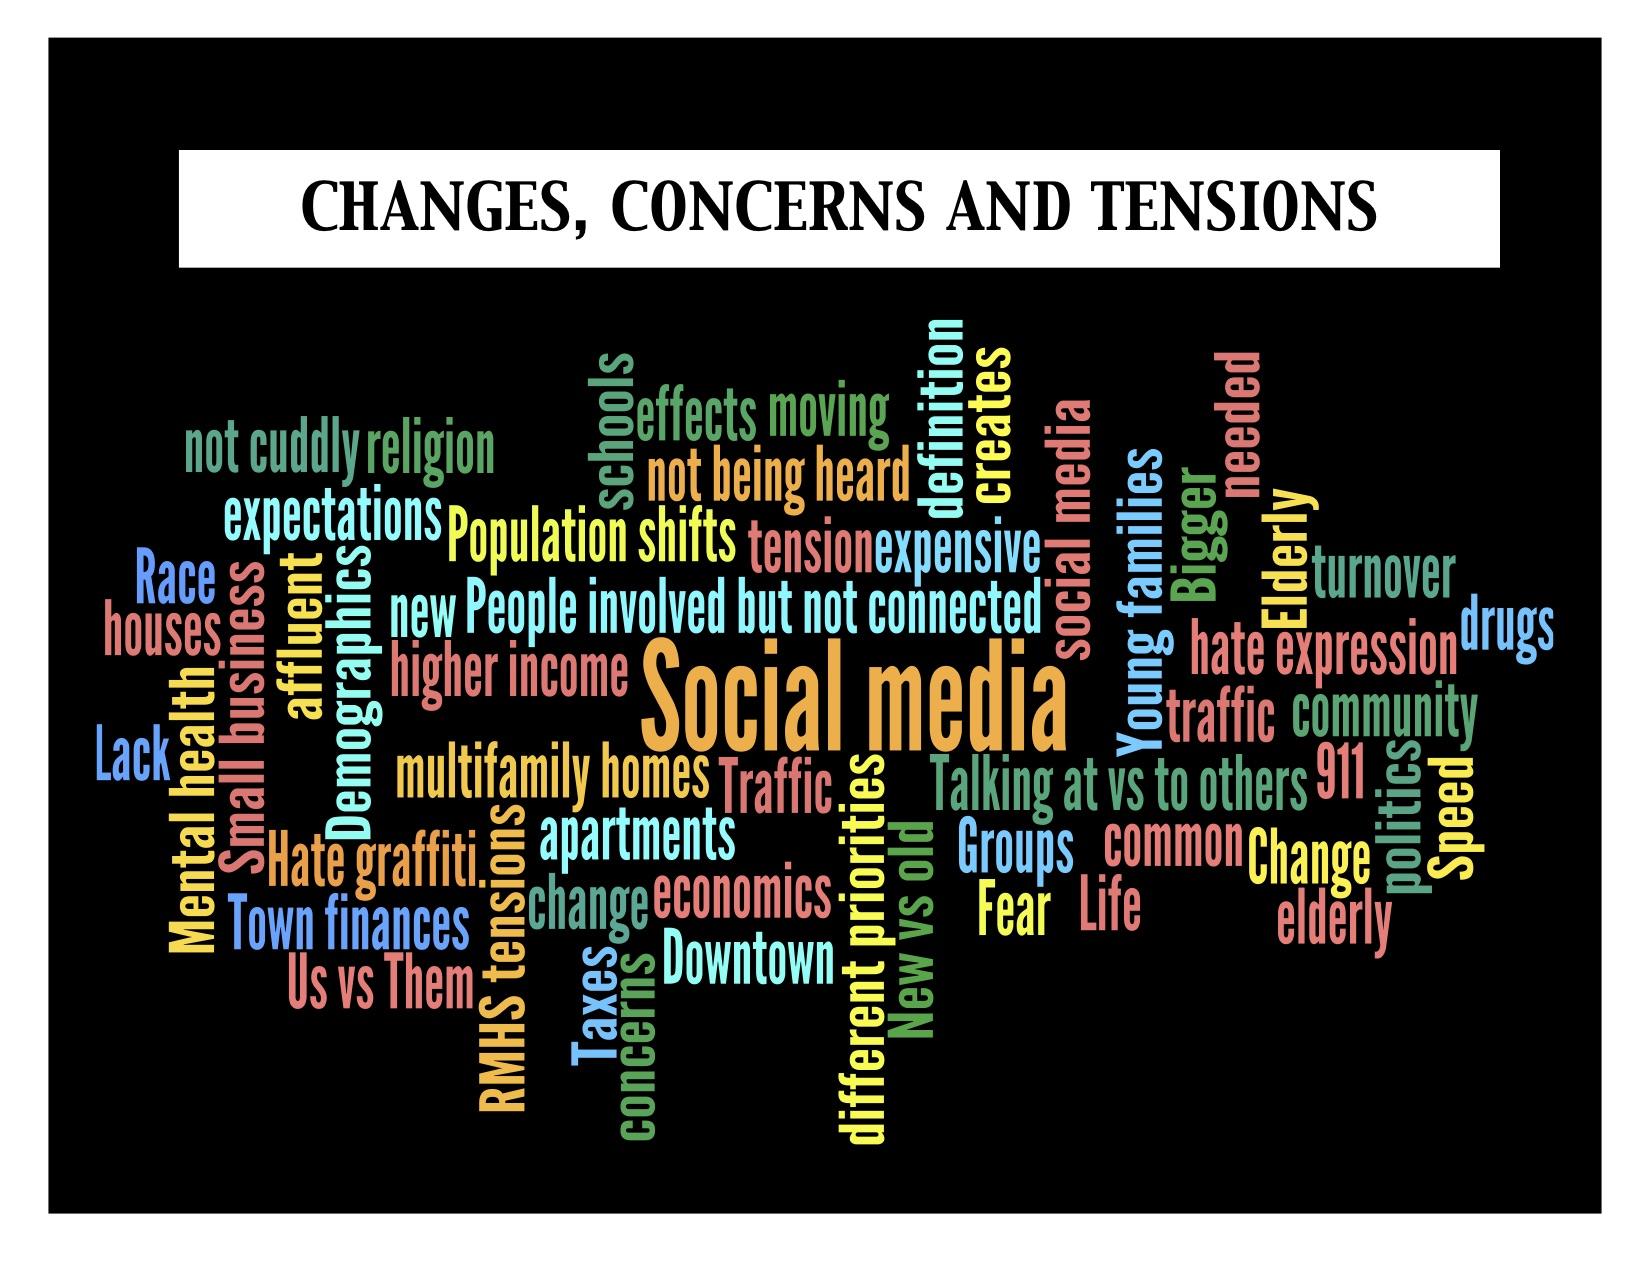 changes concerns tensions labled.jpg